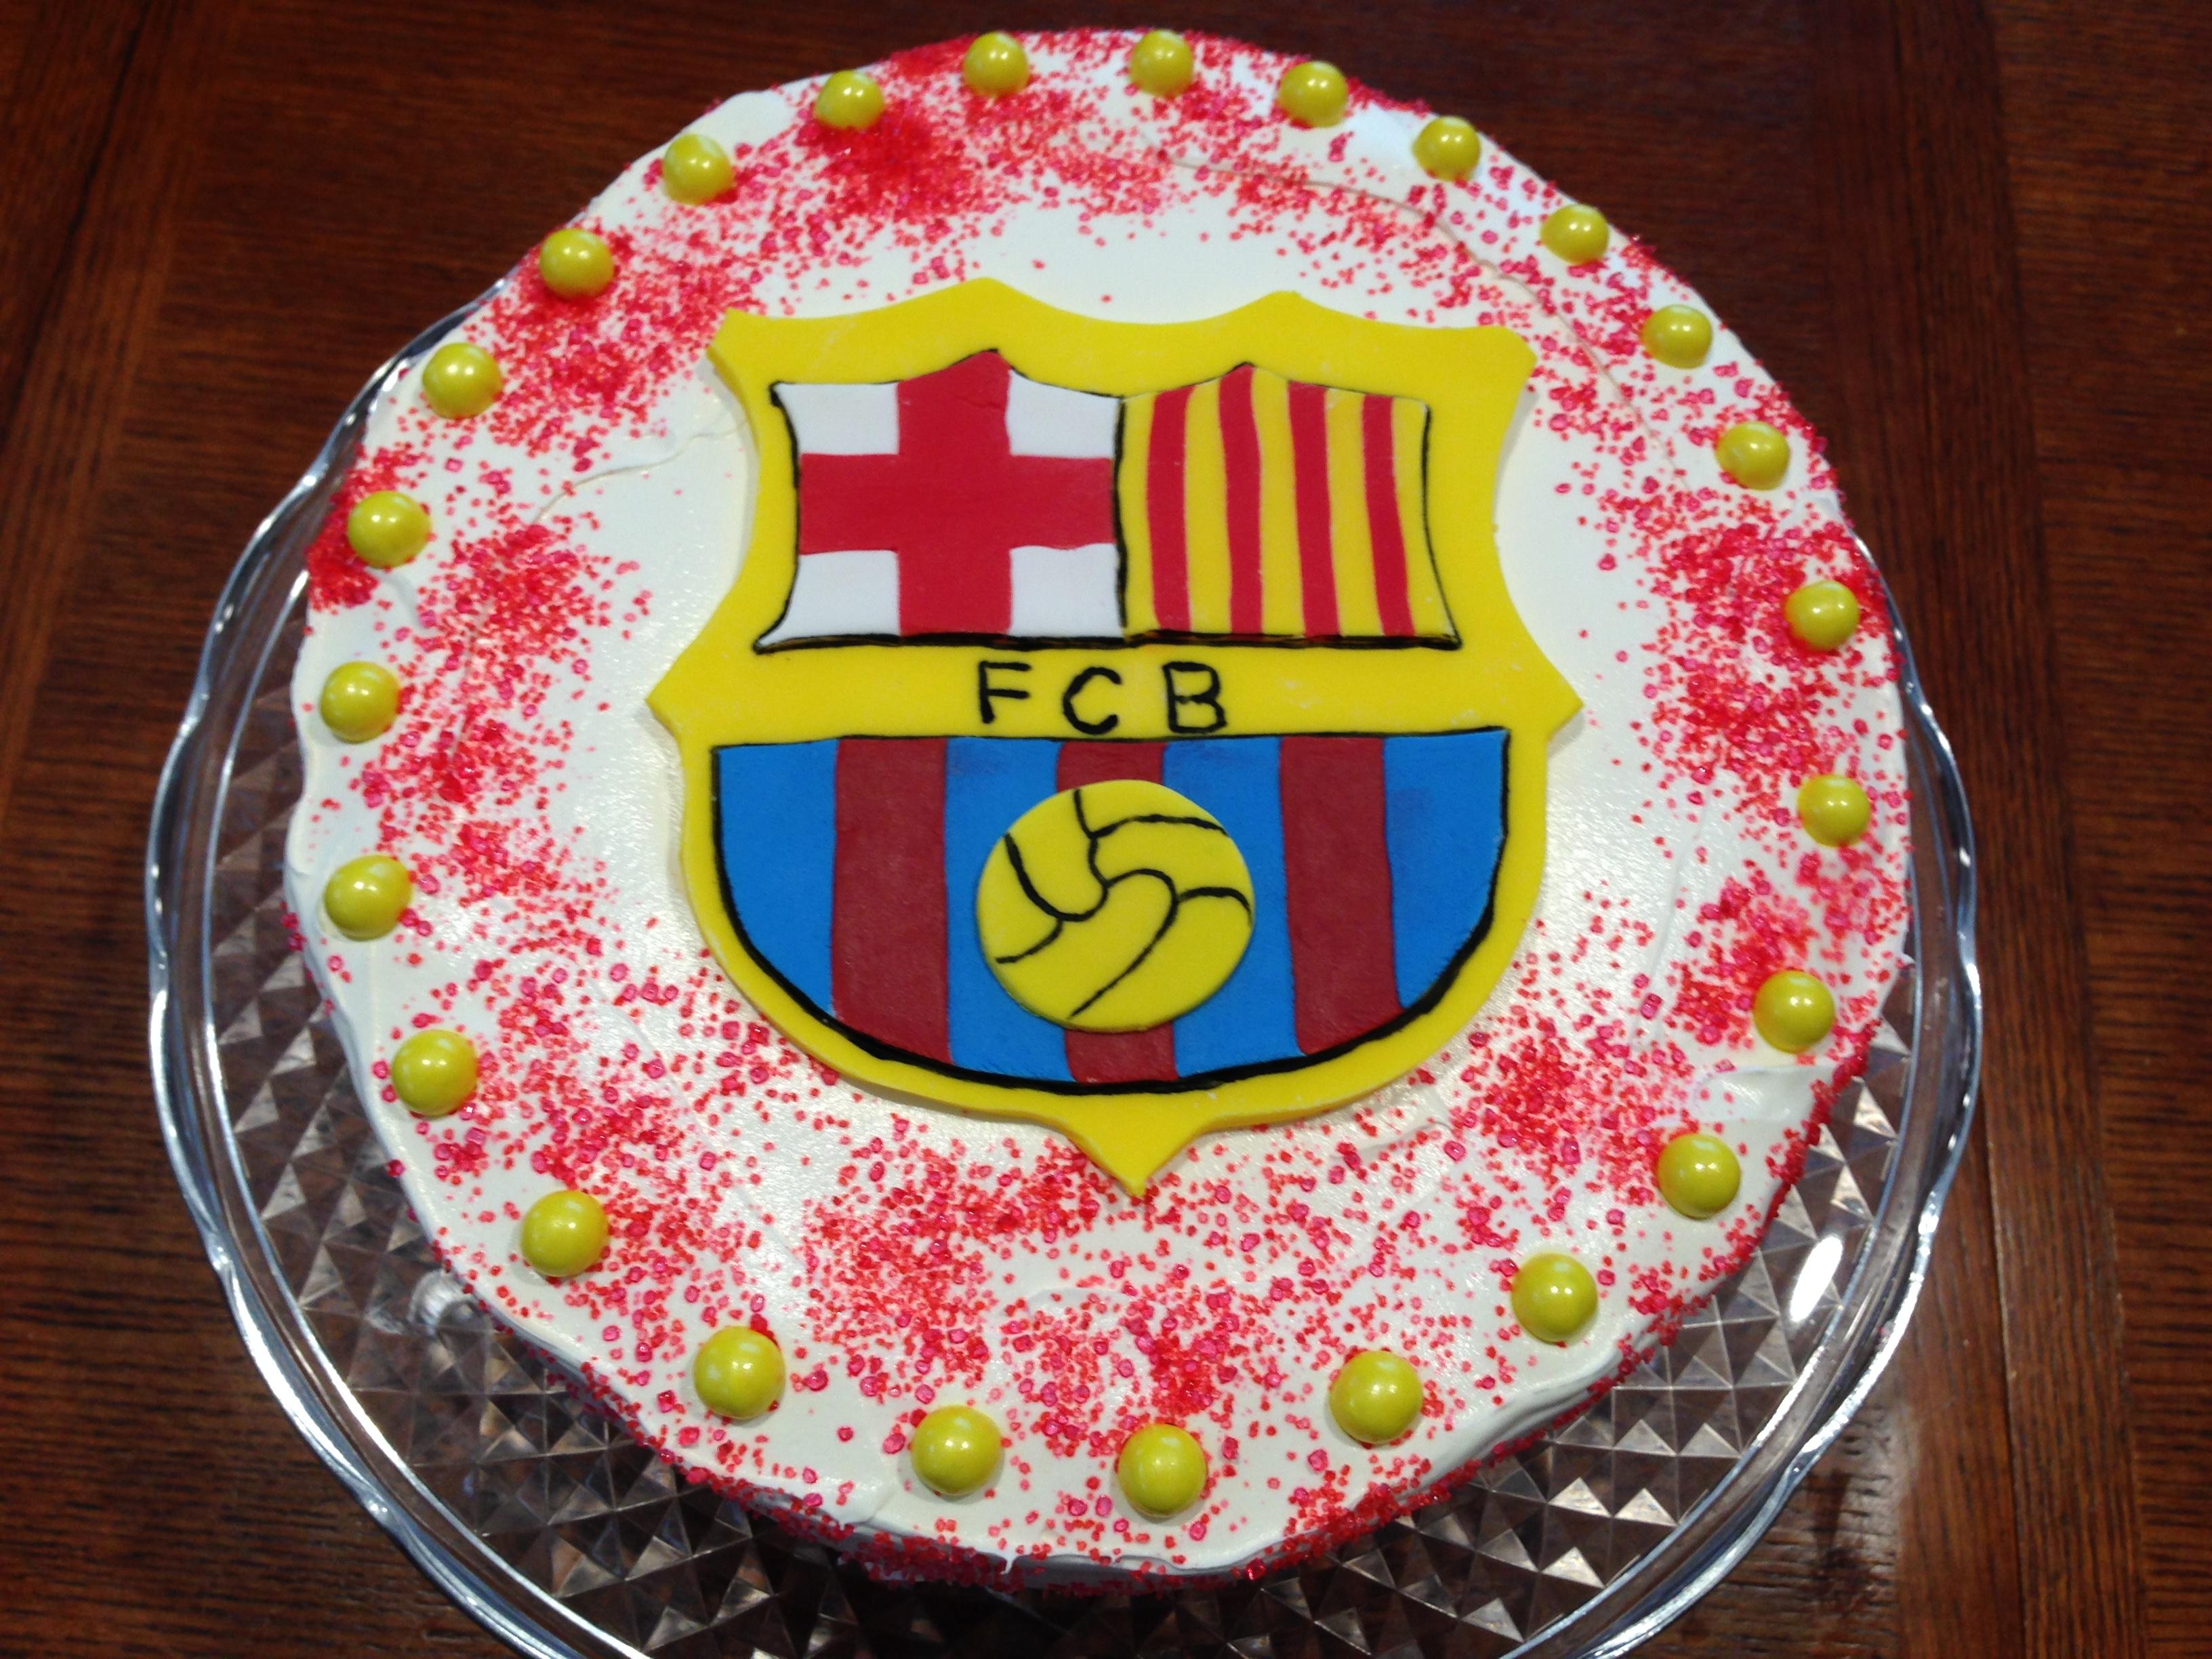 Barcelona Fan ice cream cake